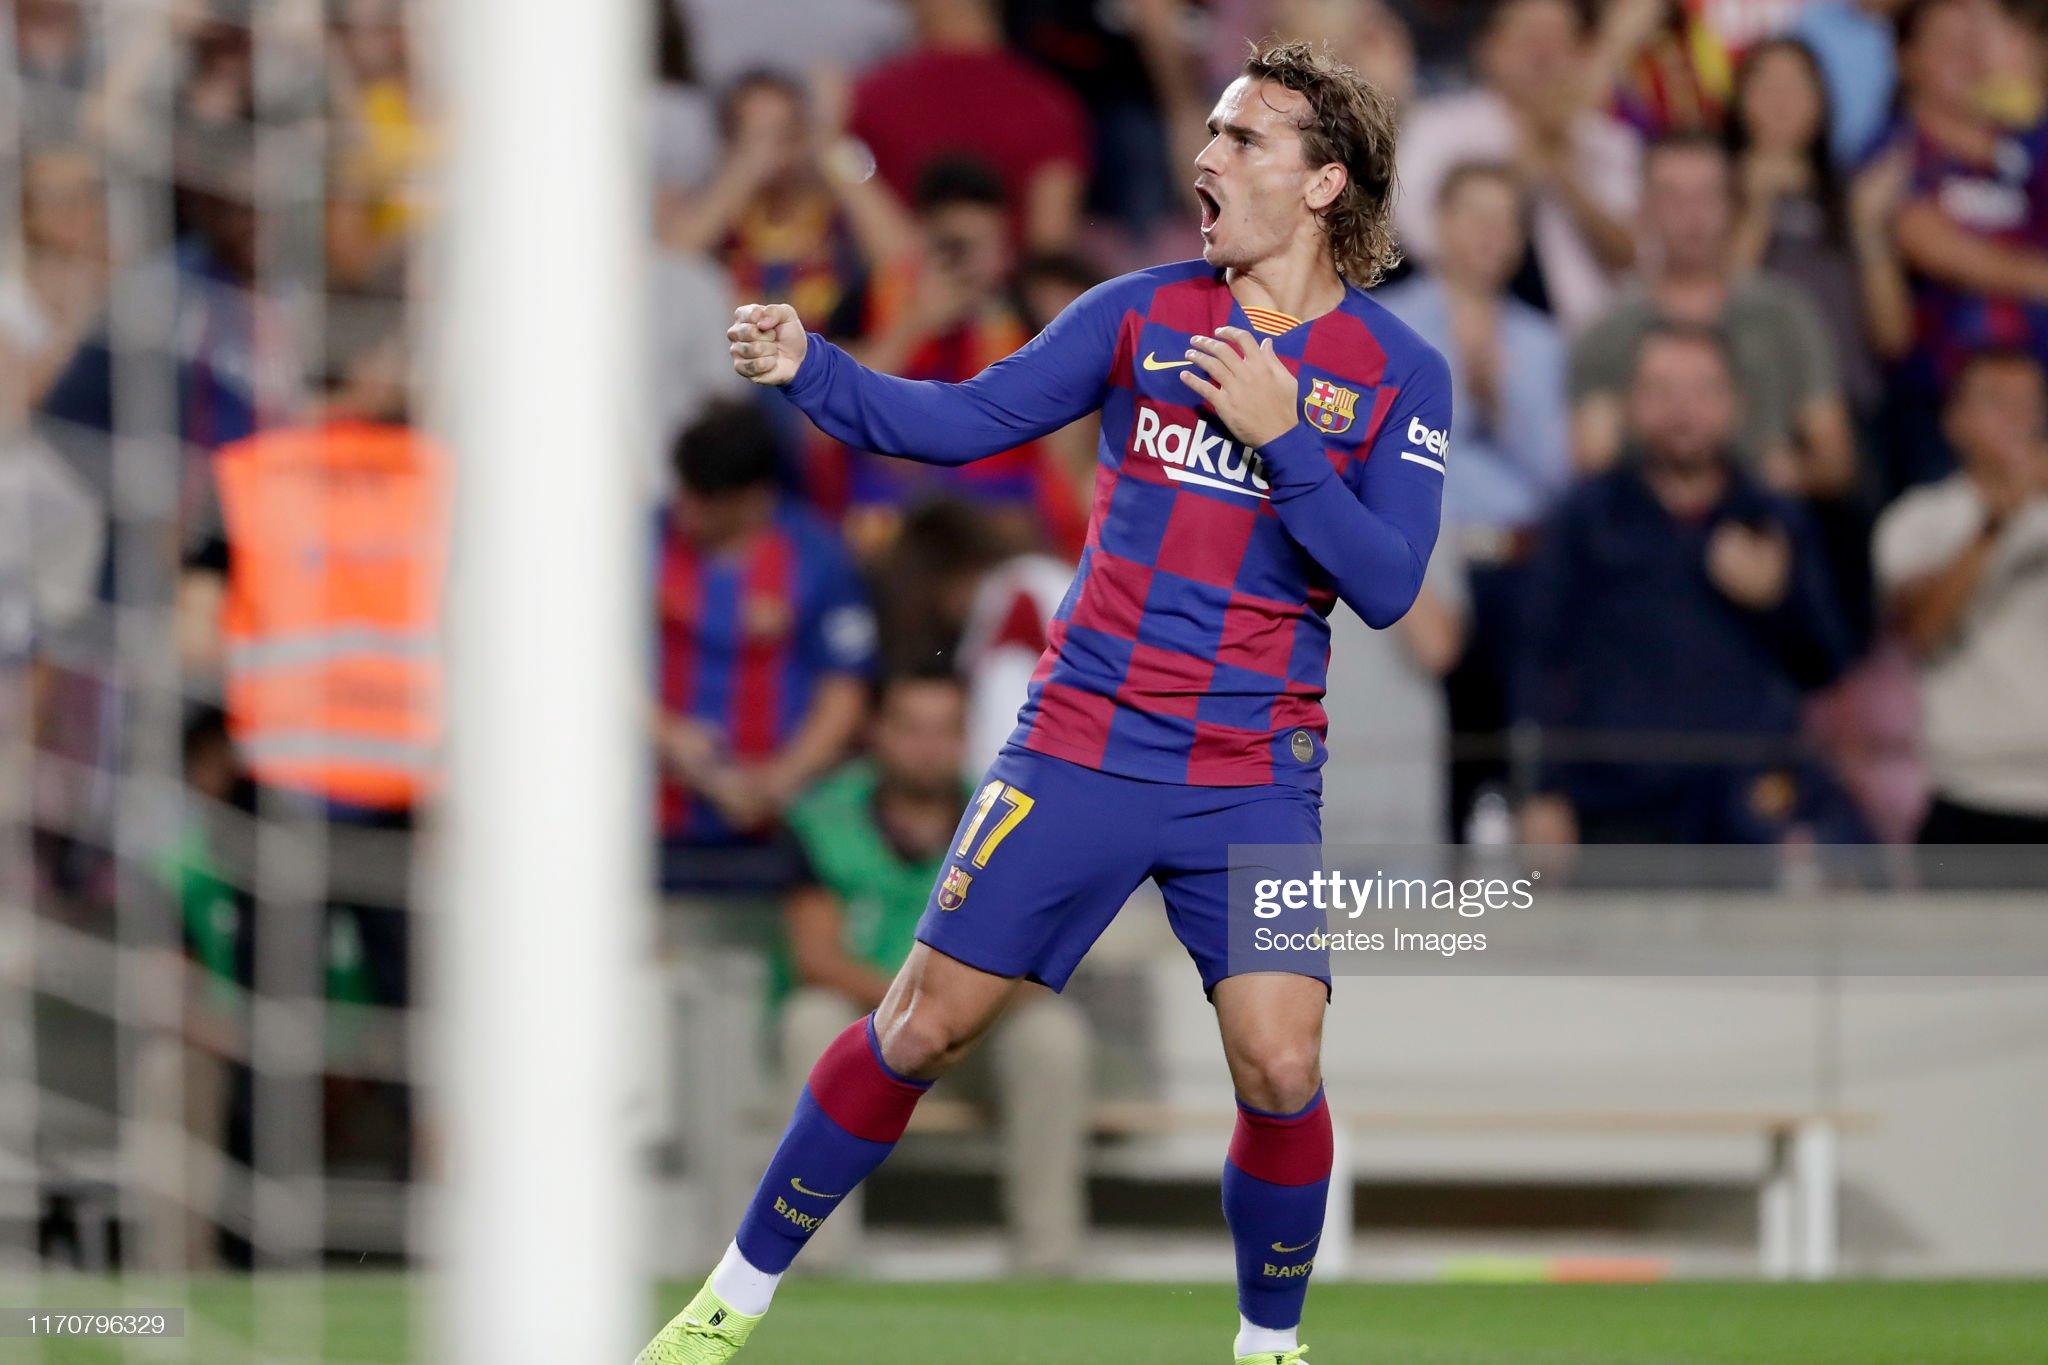 صور مباراة : برشلونة - فياريال 2-1 ( 24-09-2019 )  Antoine-griezmann-of-fc-barcelona-celebratess-10-during-the-la-liga-picture-id1170796329?s=2048x2048